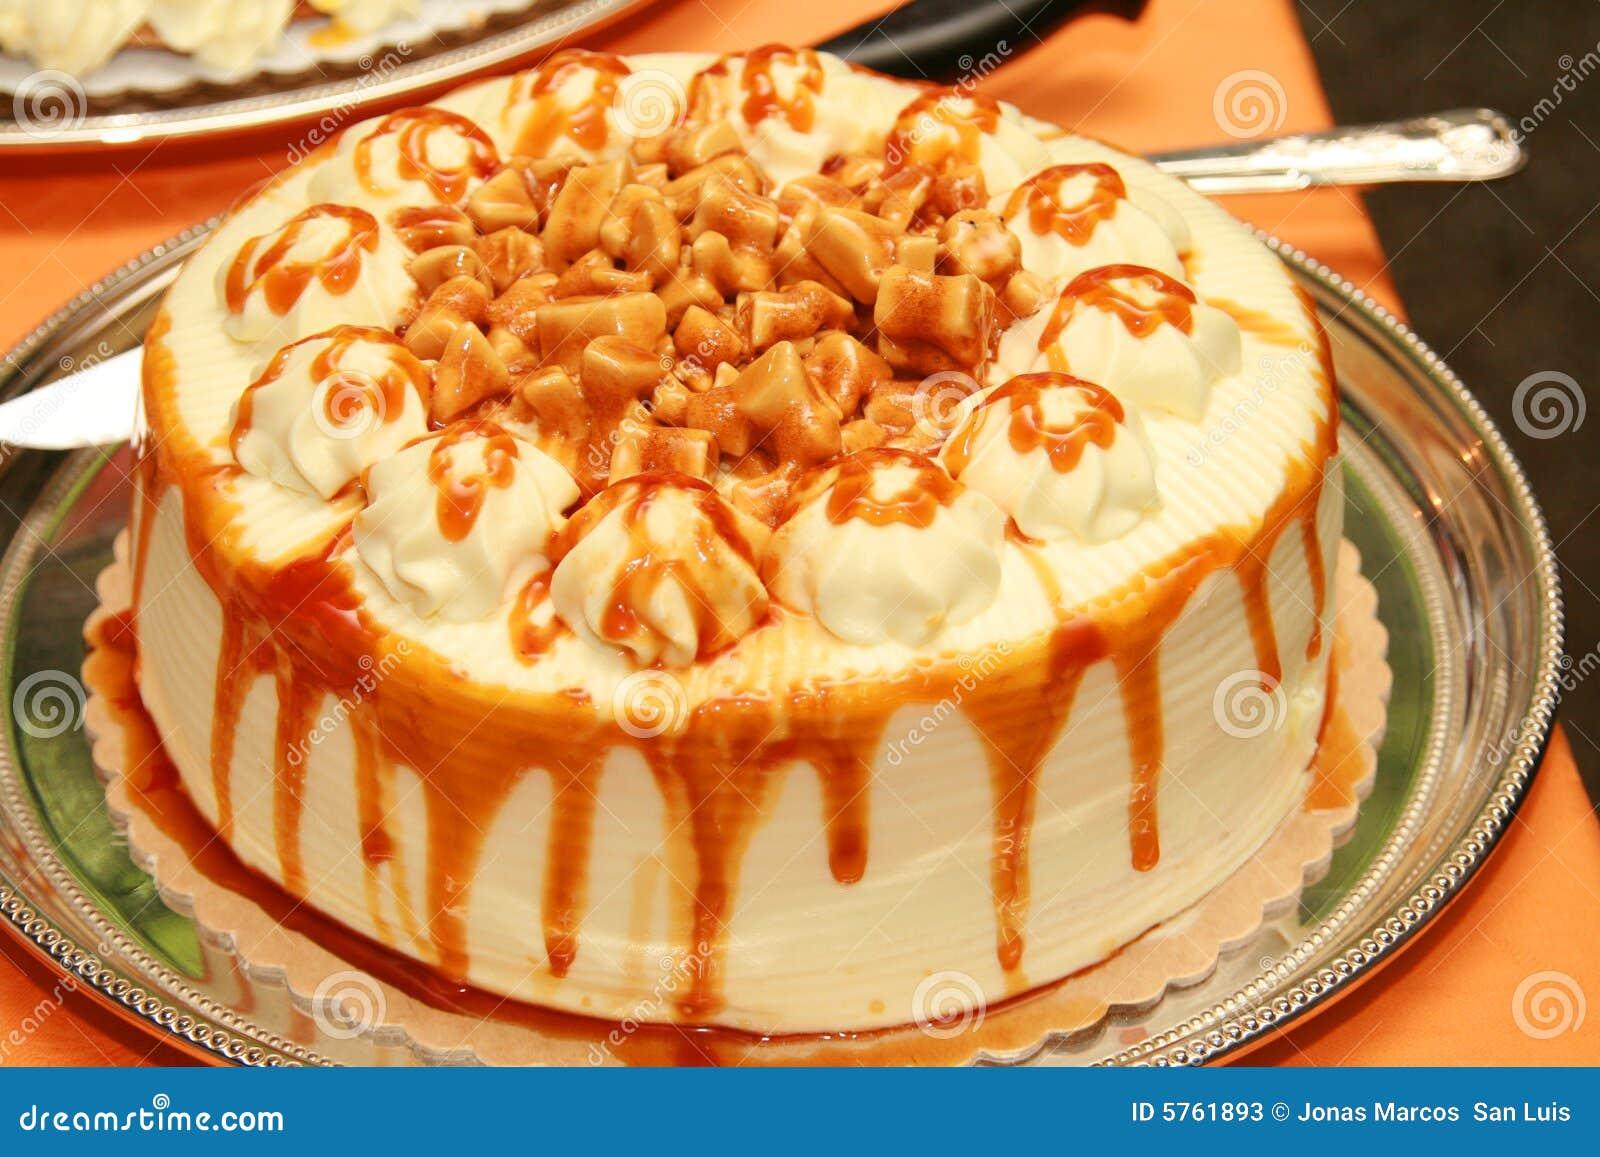 Caramel Syrup For Cake